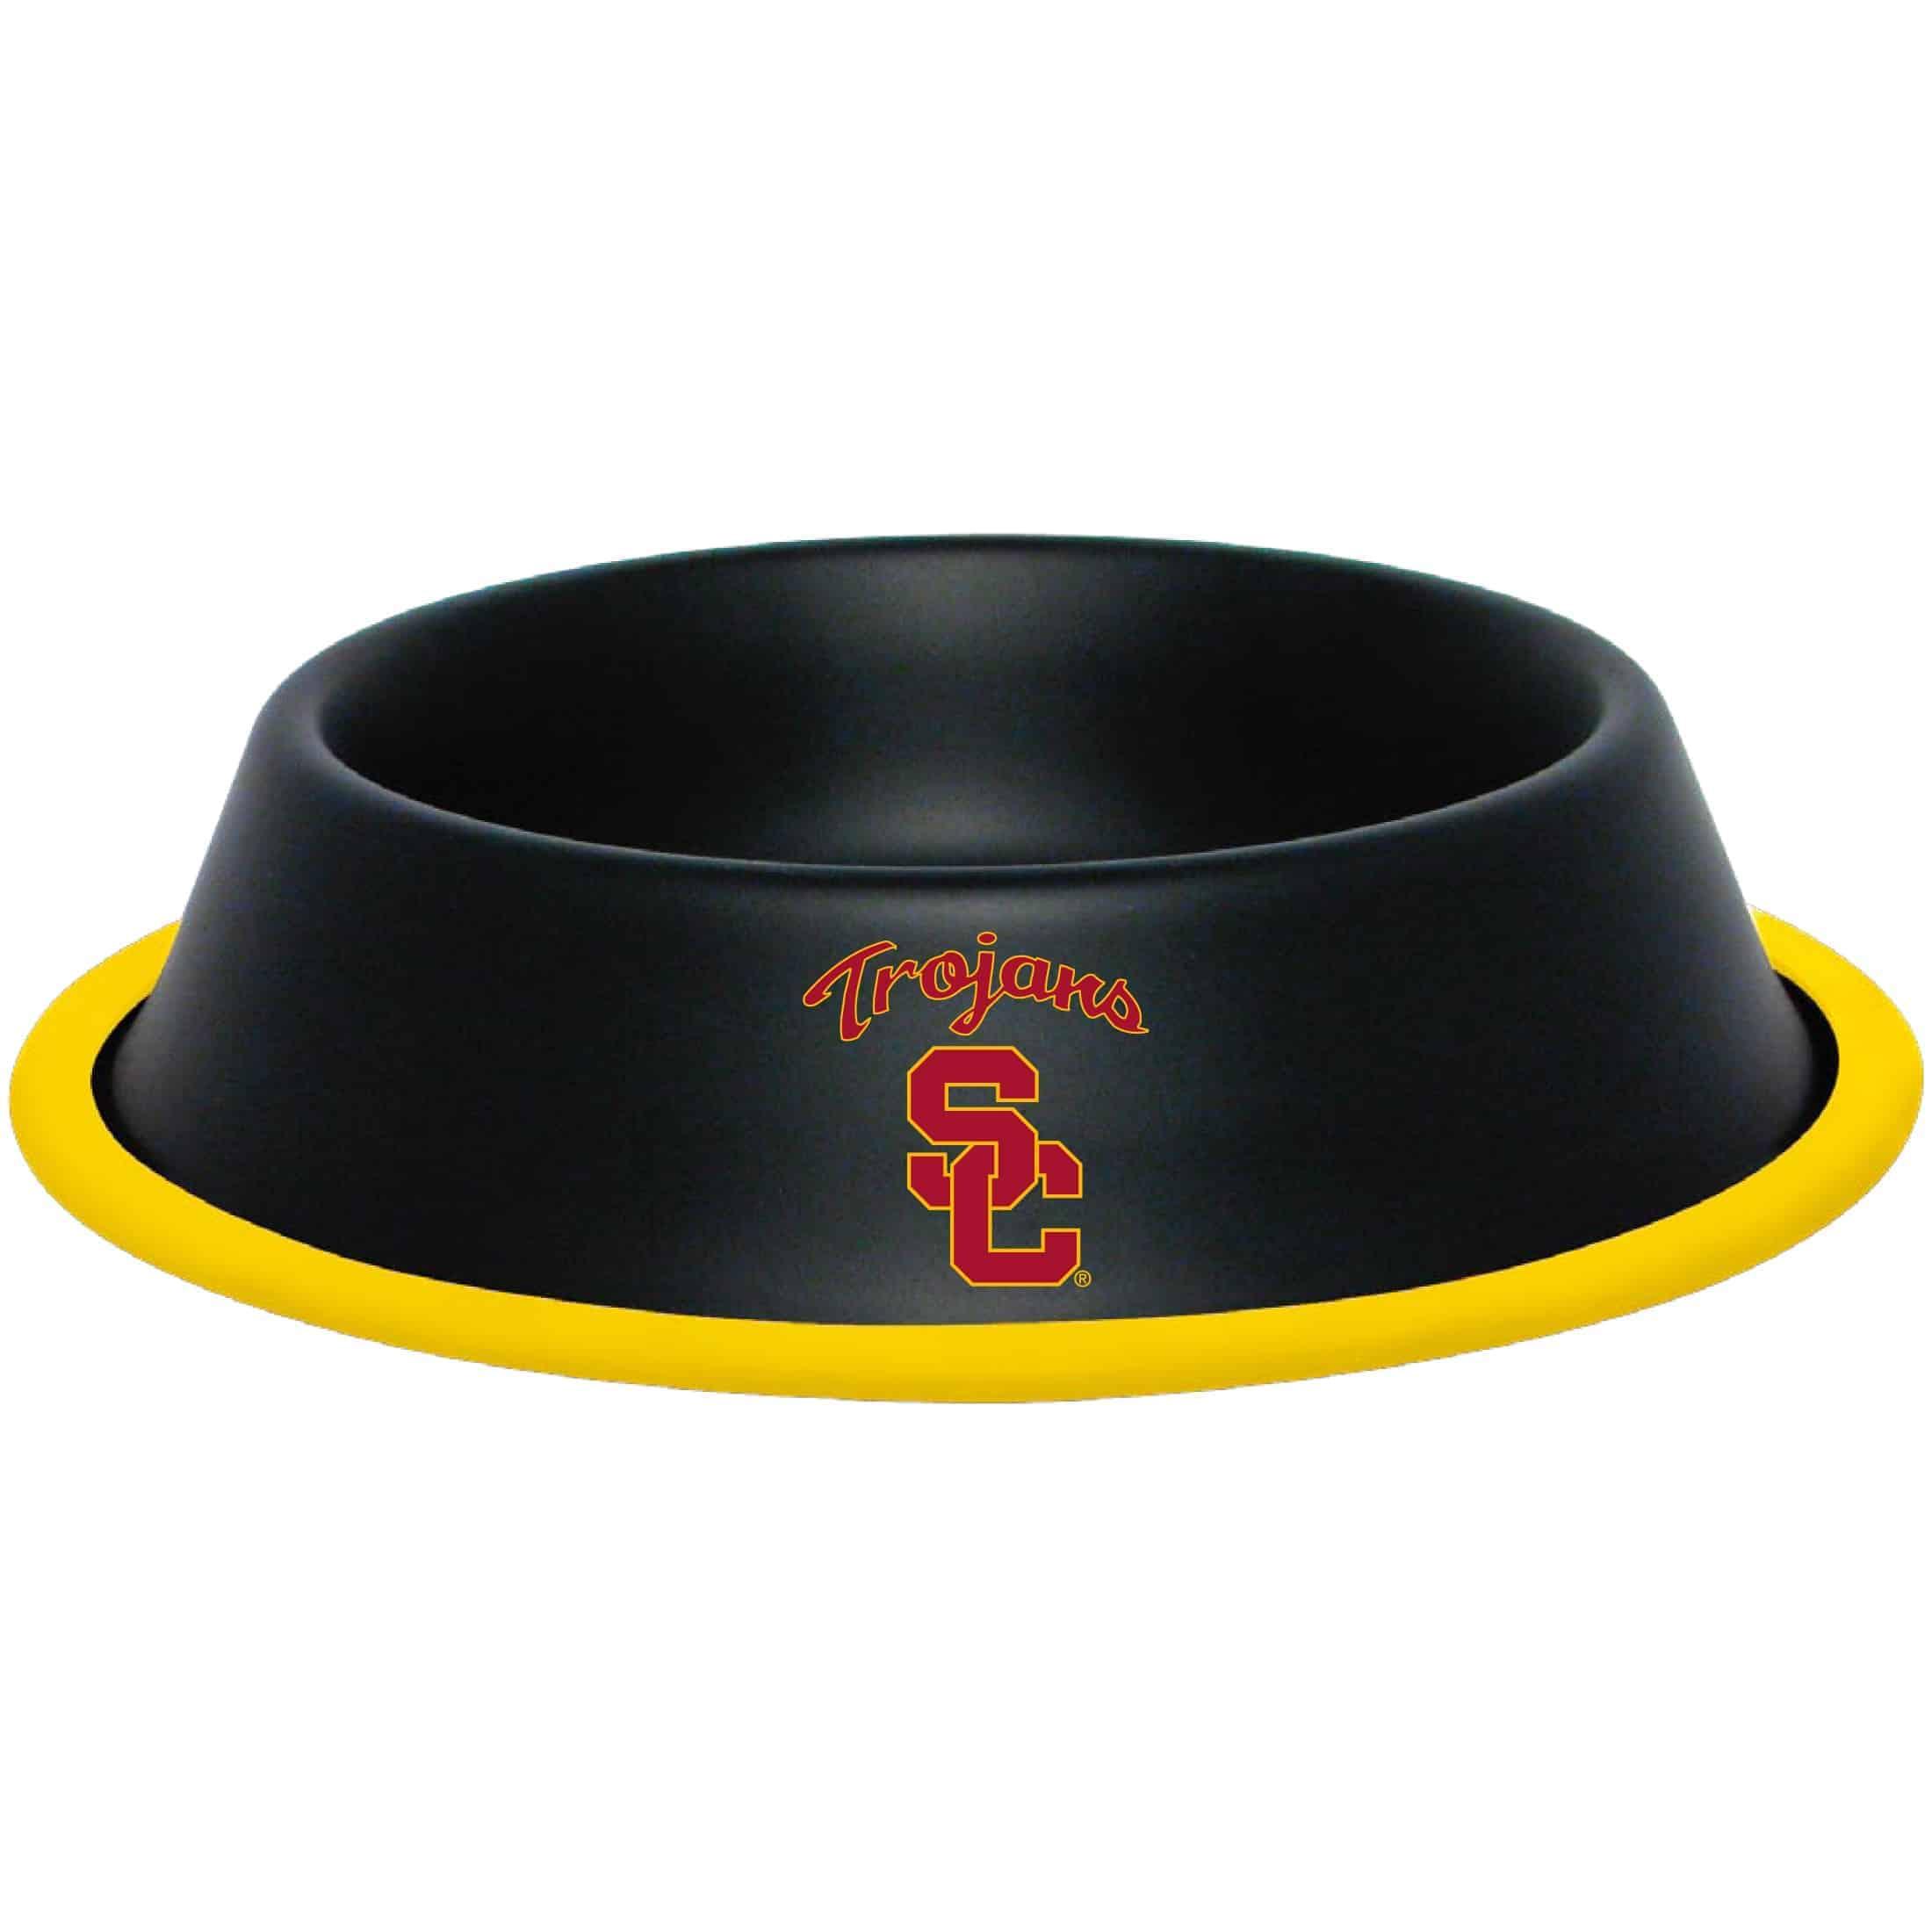 USC Trojans Dog Bowl - Stainless